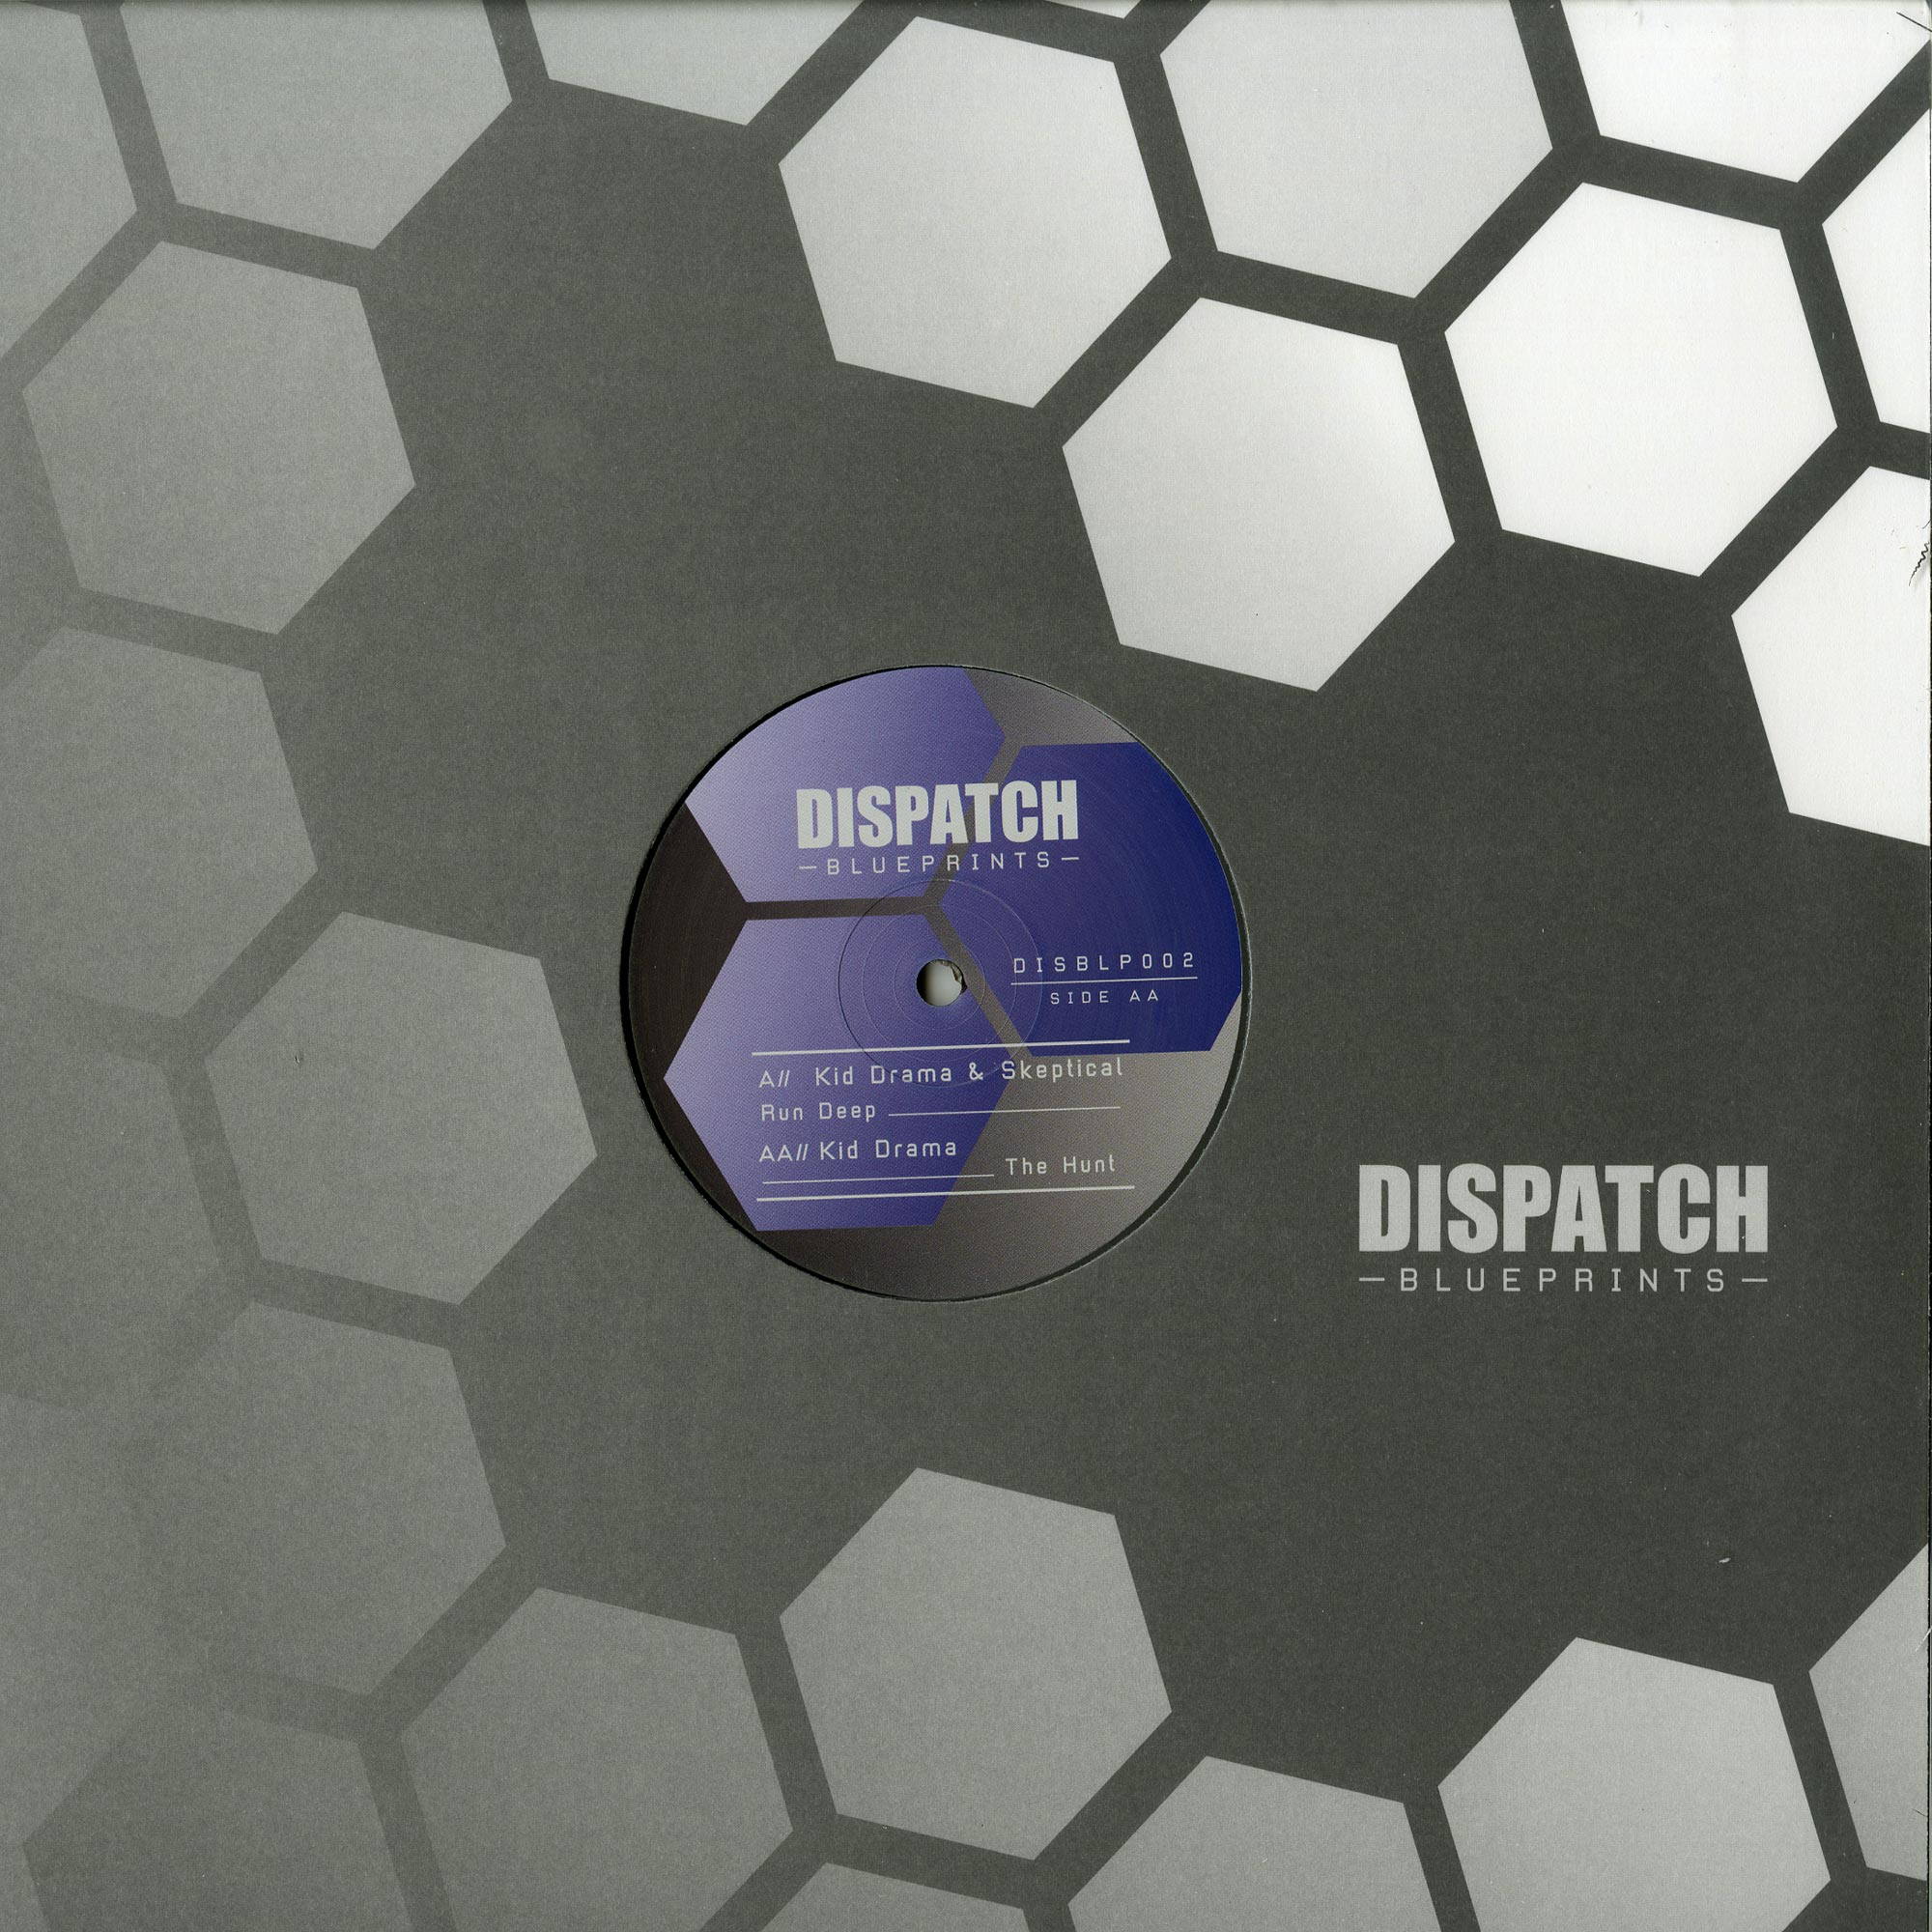 Kid Drama & Skeptical - RUN DEEP / THE HUNT